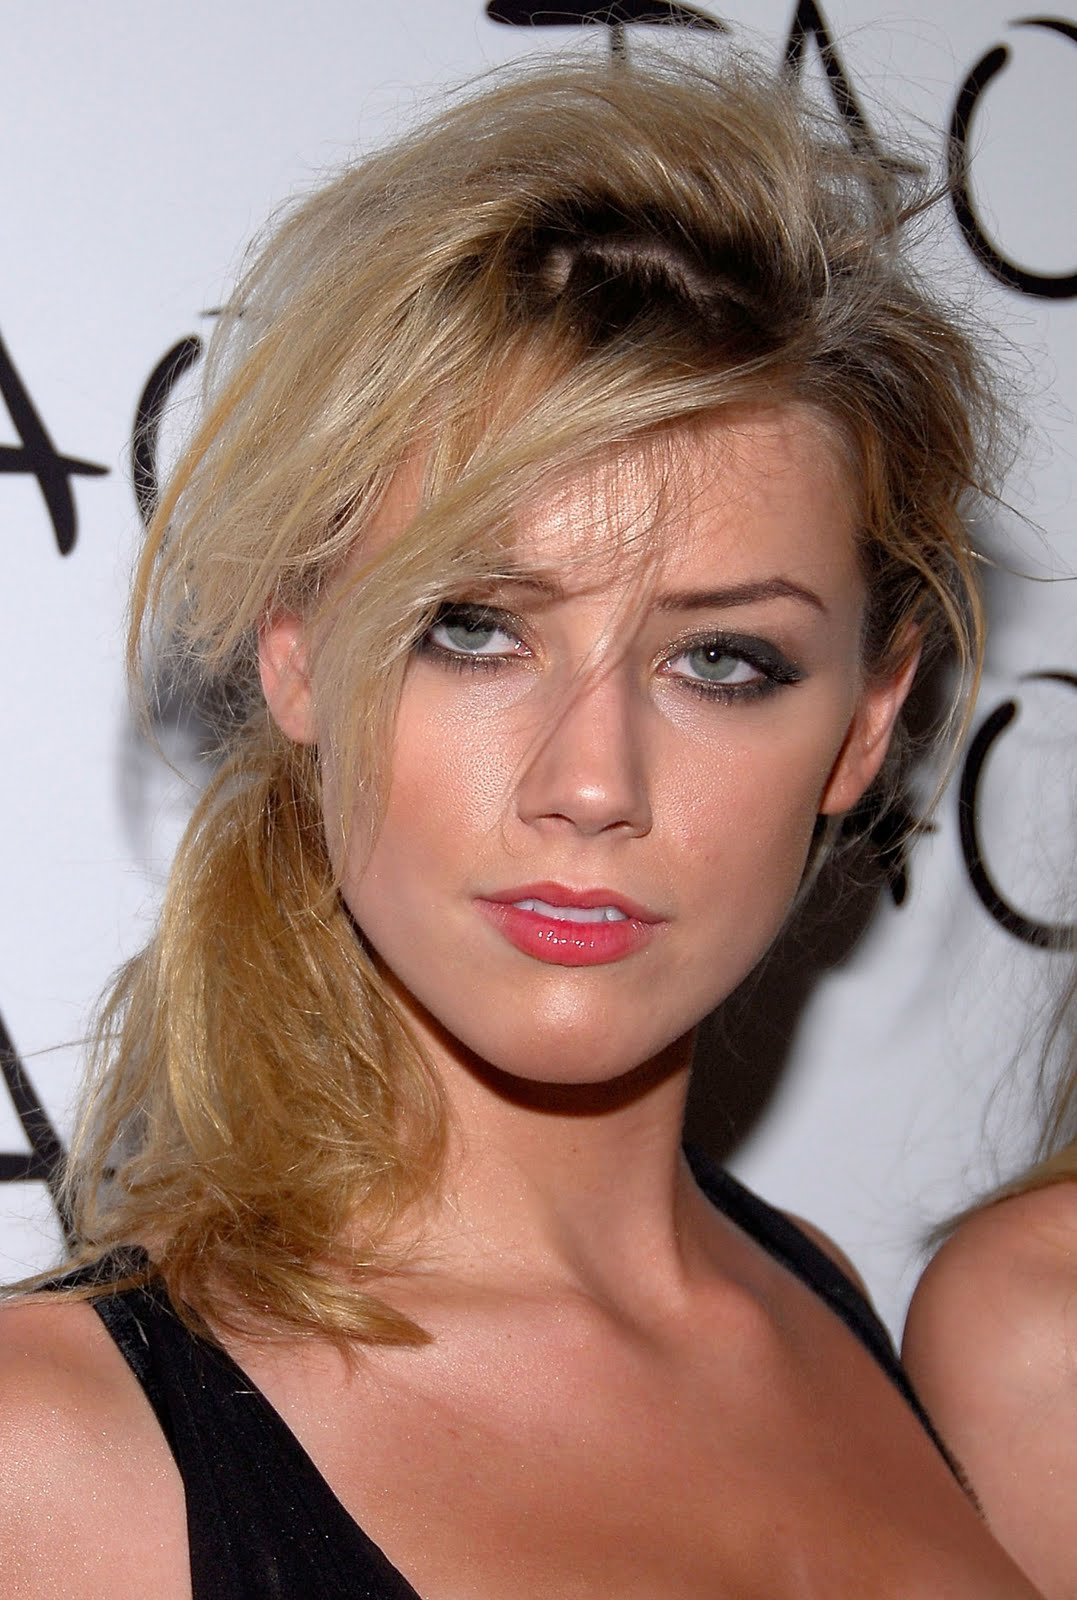 Checker Cab London >> Lankan Post: Amber Heard